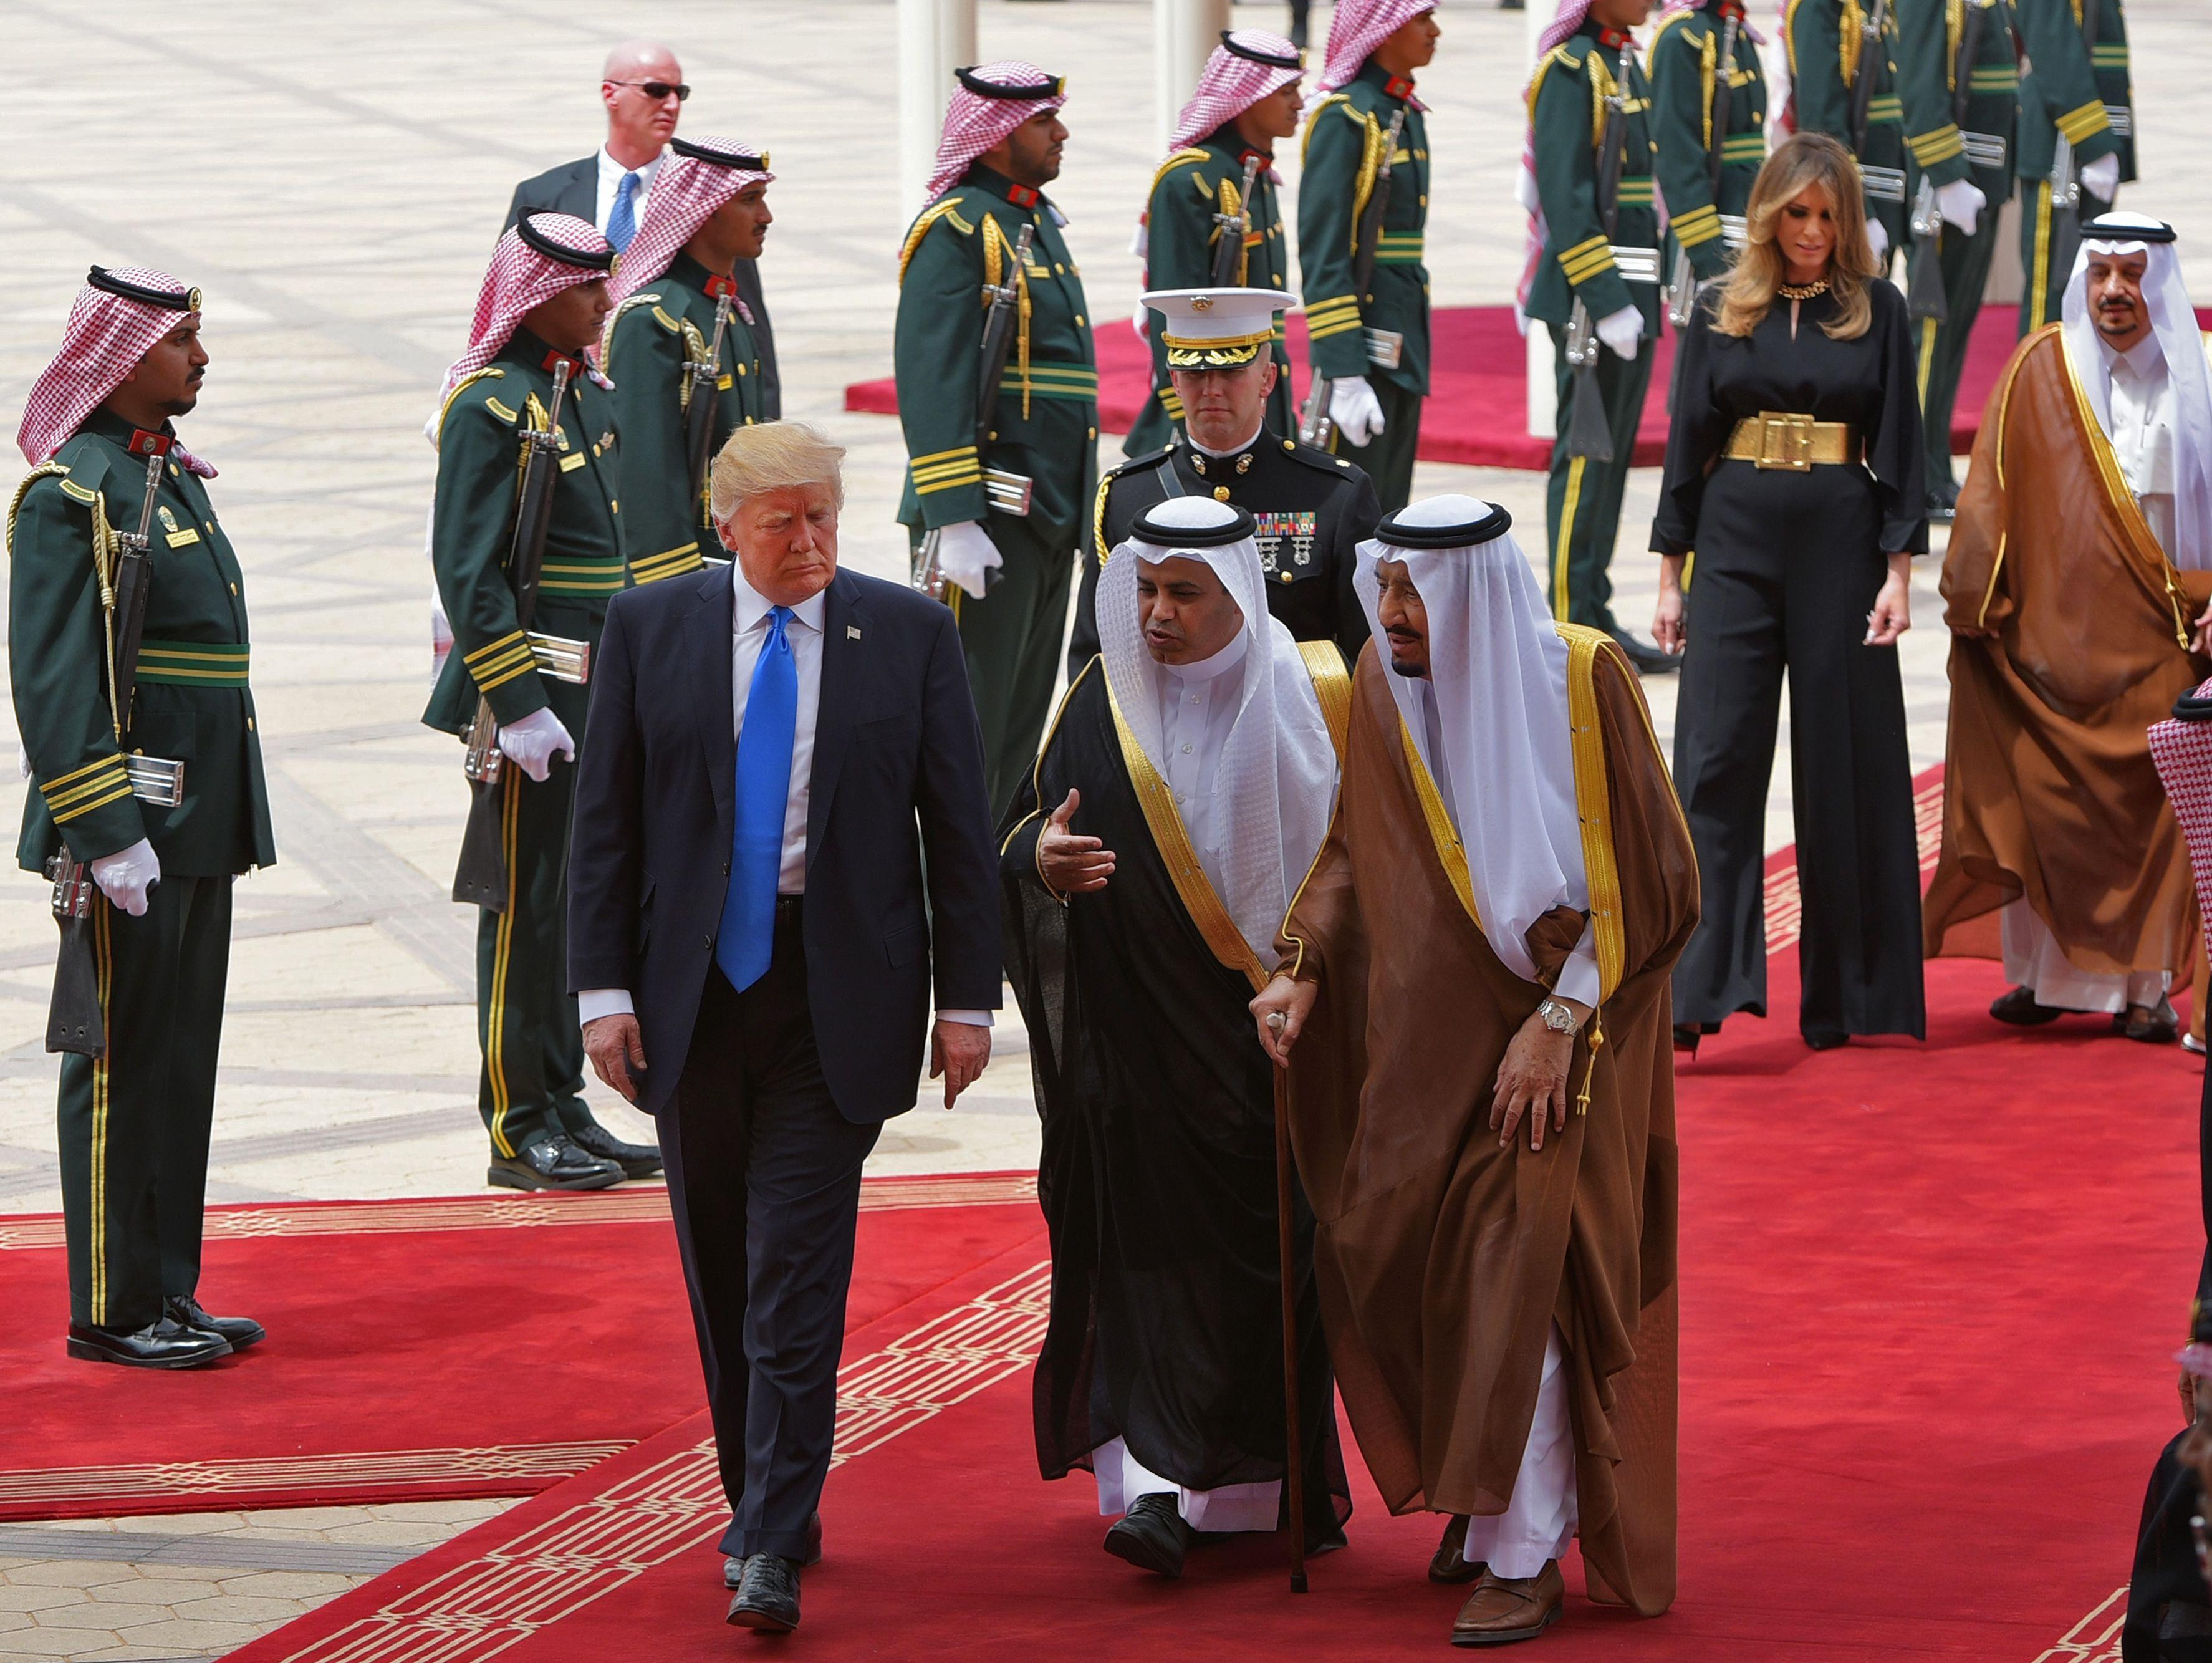 President Donald Trump is welcomed by Saudi King Salman bin Abdulaziz al-Saud (3rd R) upon arrival at King Khalid International Airport in Riyadh on May 20, 2017, followed by First Lady Melania Trump.  (MANDEL NGAN/AFP/Getty Images)